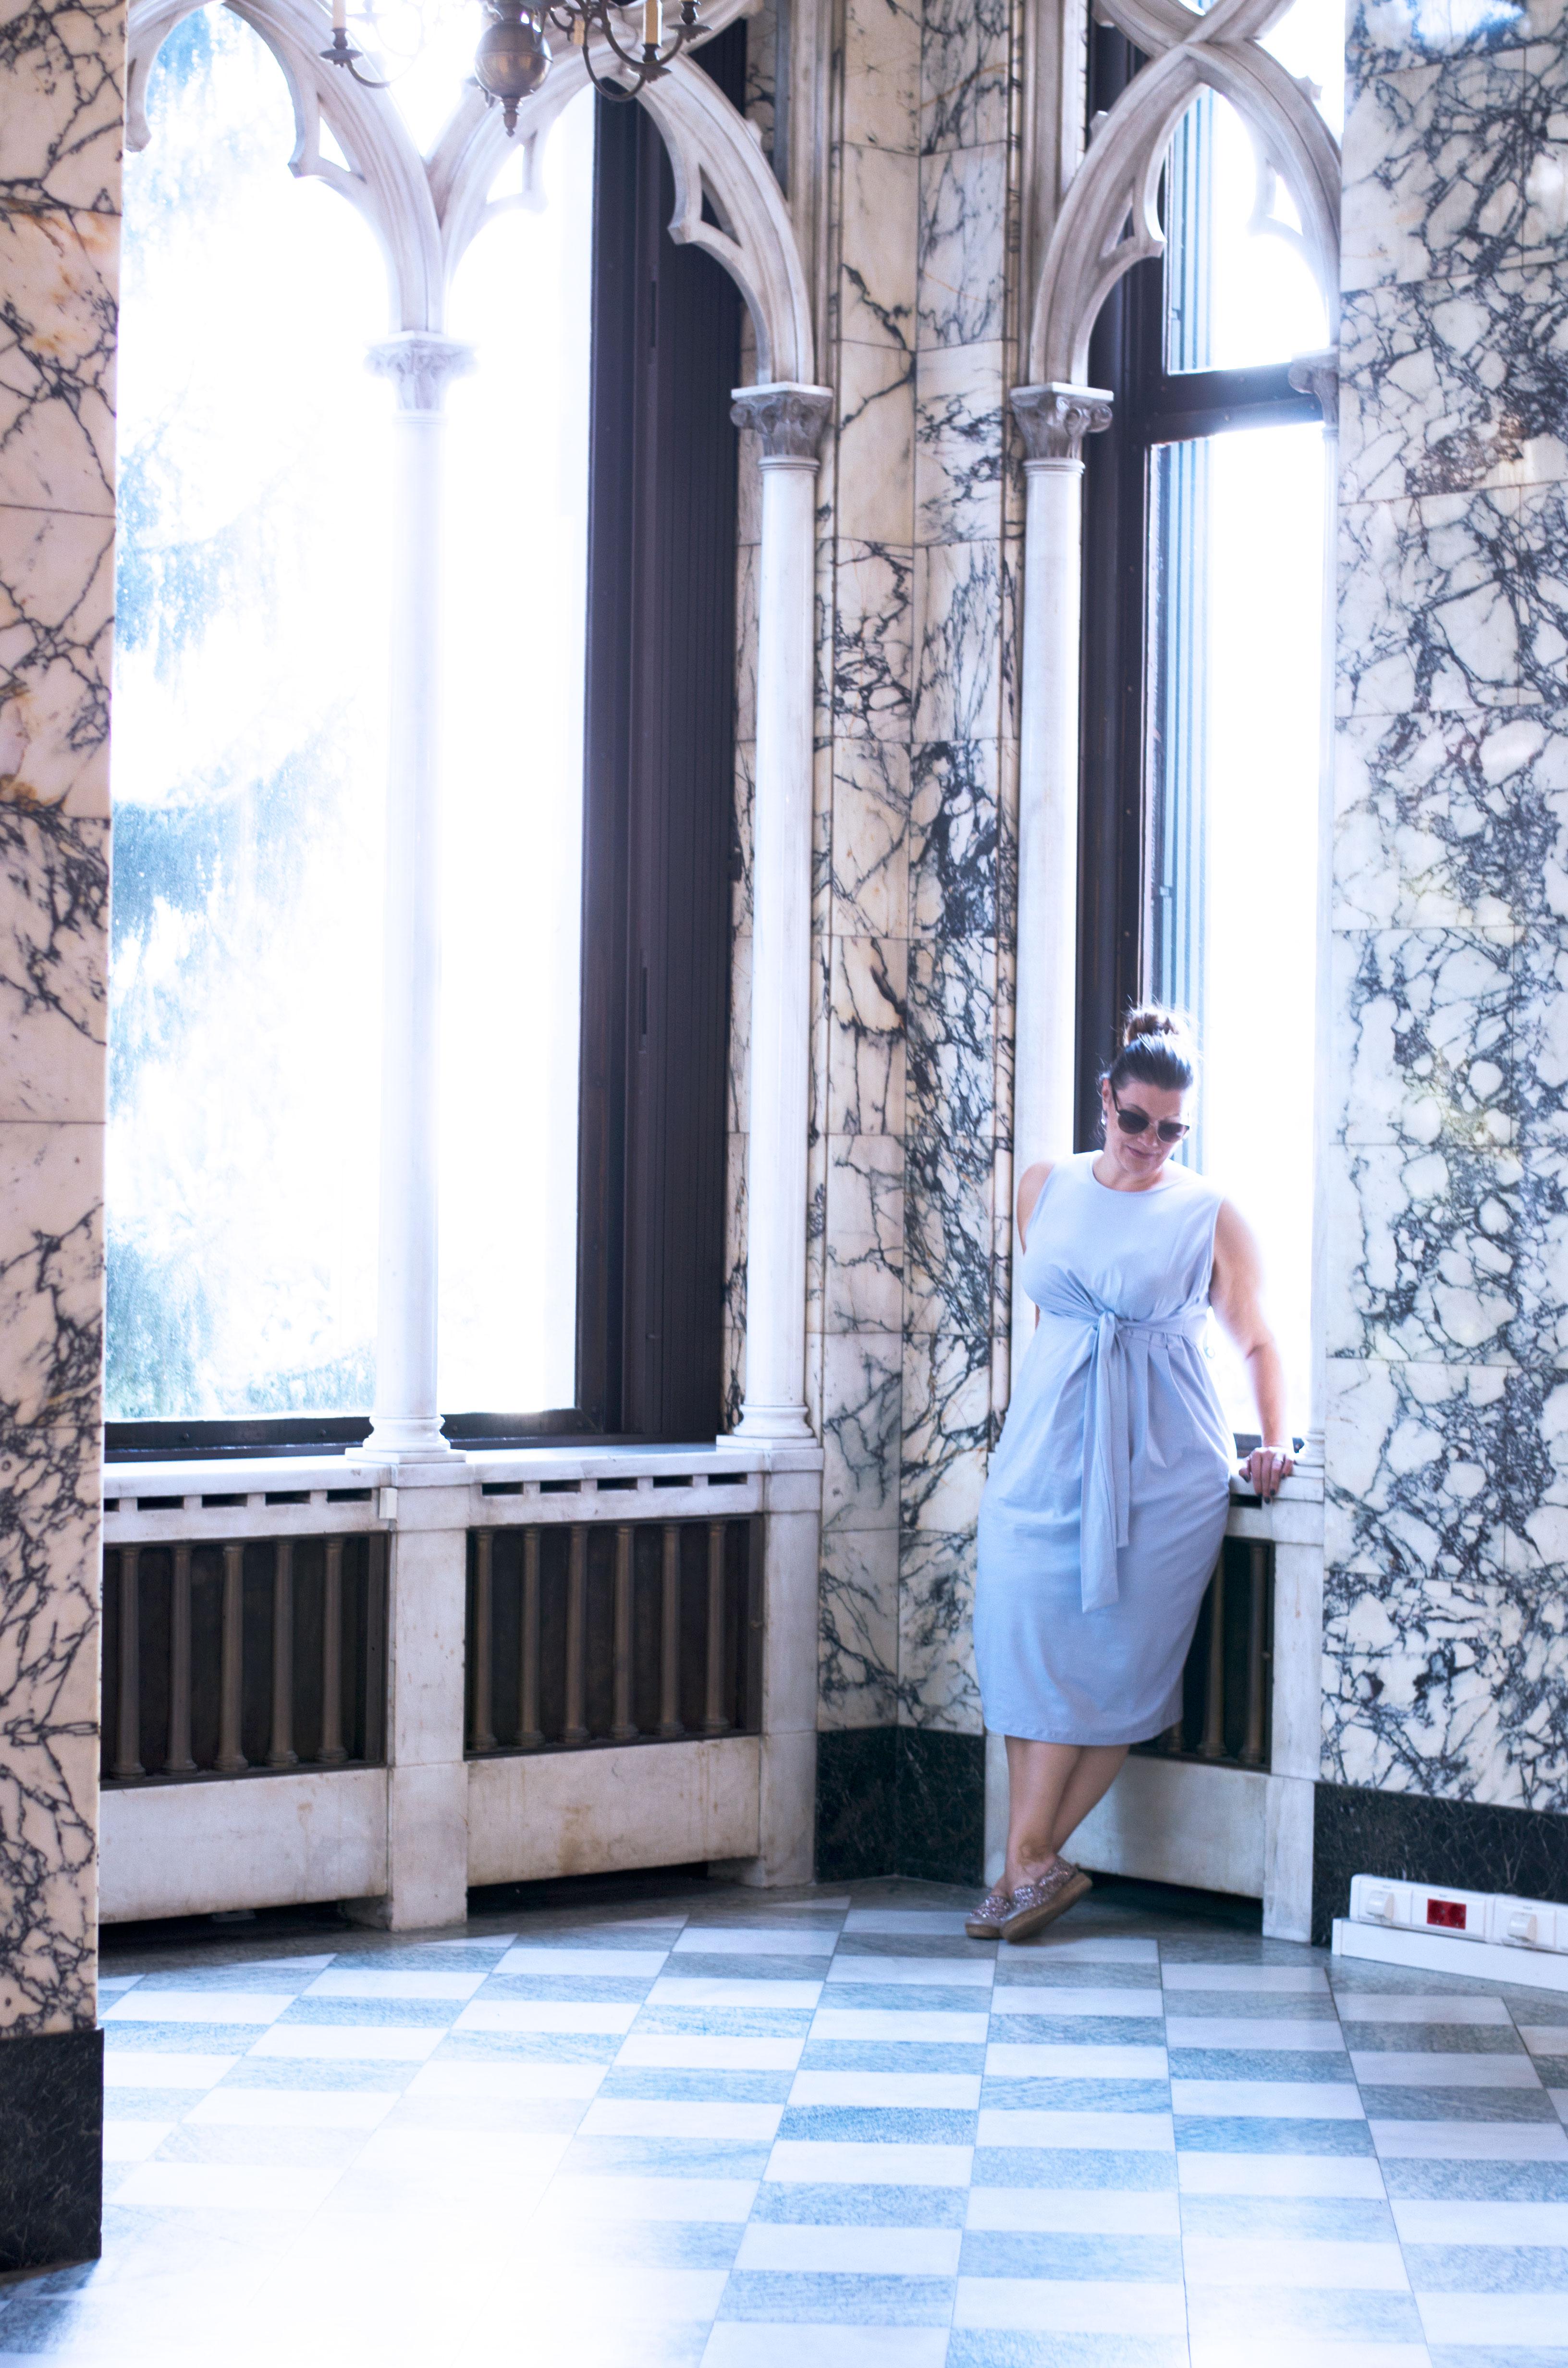 plussize-my-look-outfit-fashion-asos-loves-curves-kardiaserena-midikleid-veilchen-glitzer-espadrilles-ladylike